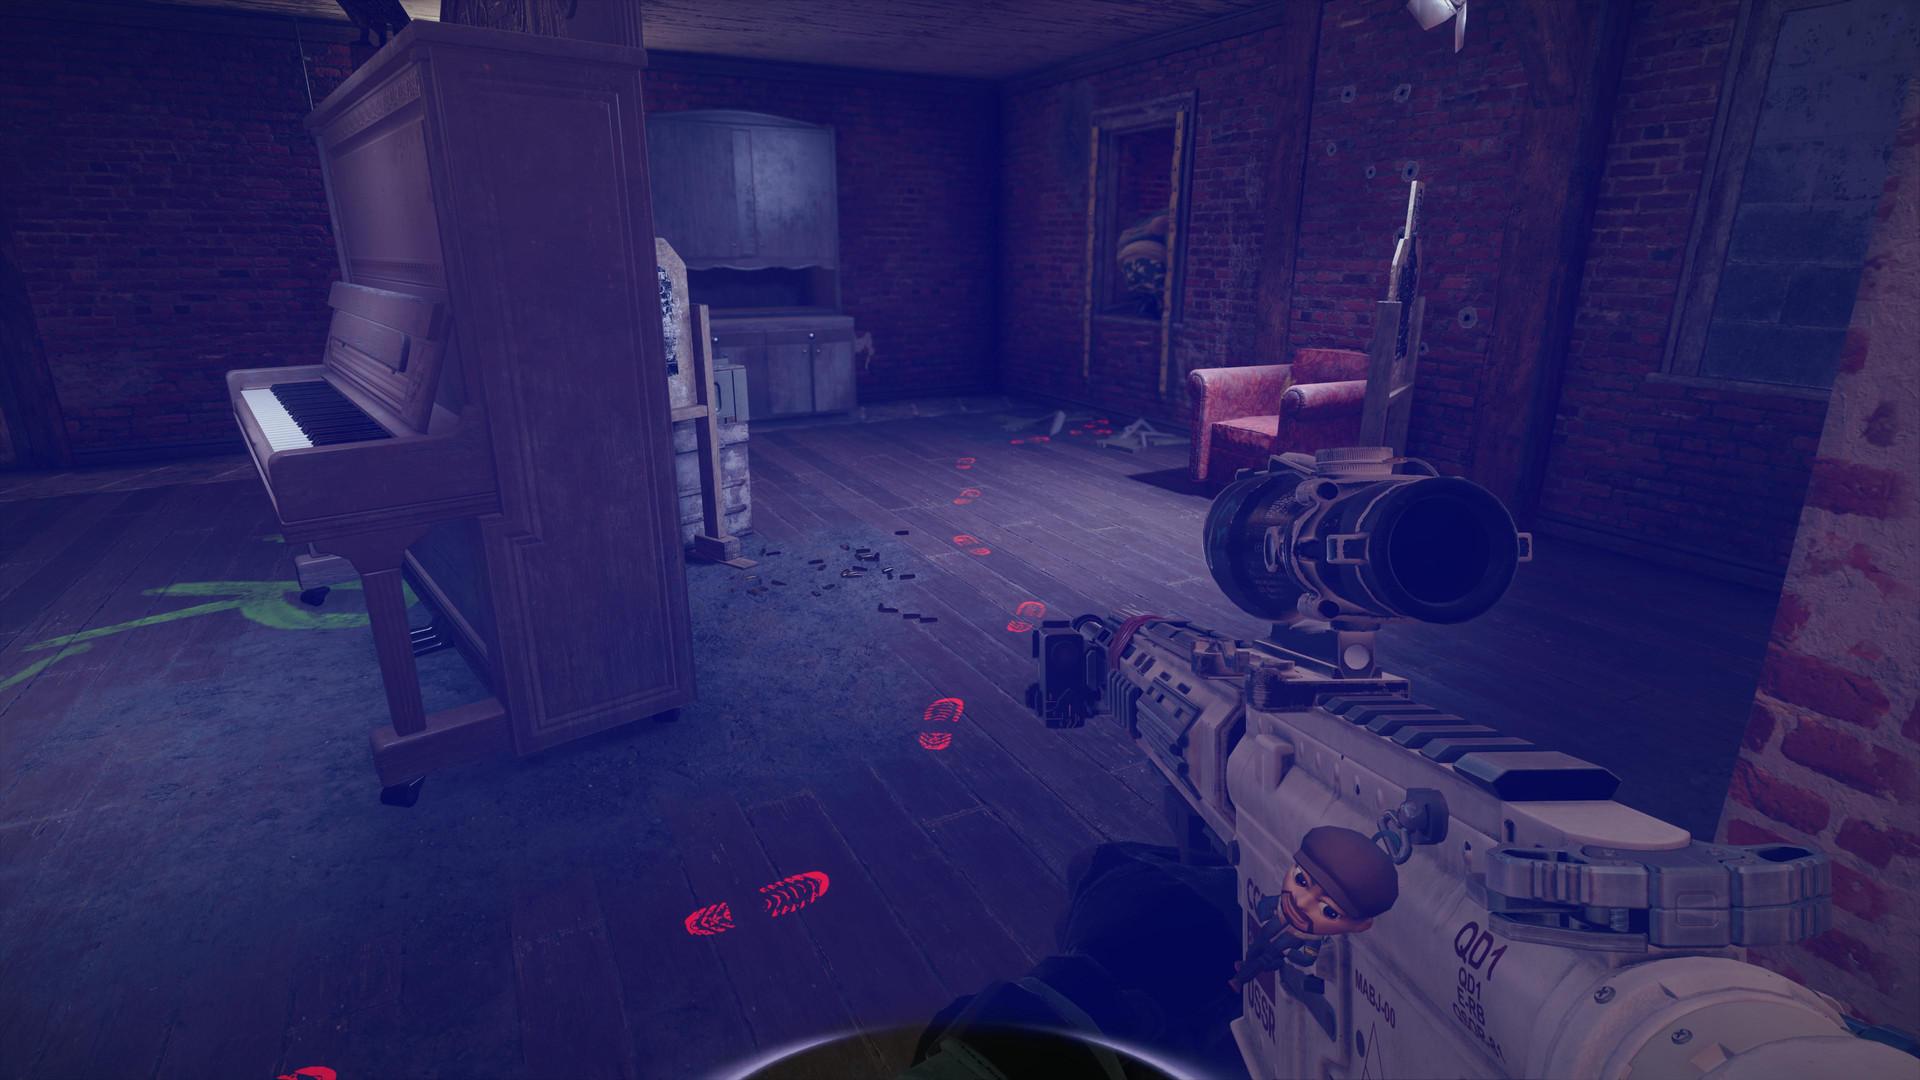 Ubisoft oslavuje IEM 2020. Rainbow Six Siege za PLN 32 na PC, 37 PLN na konzolách - hra bude pracovať na PS5 a XSX! 3